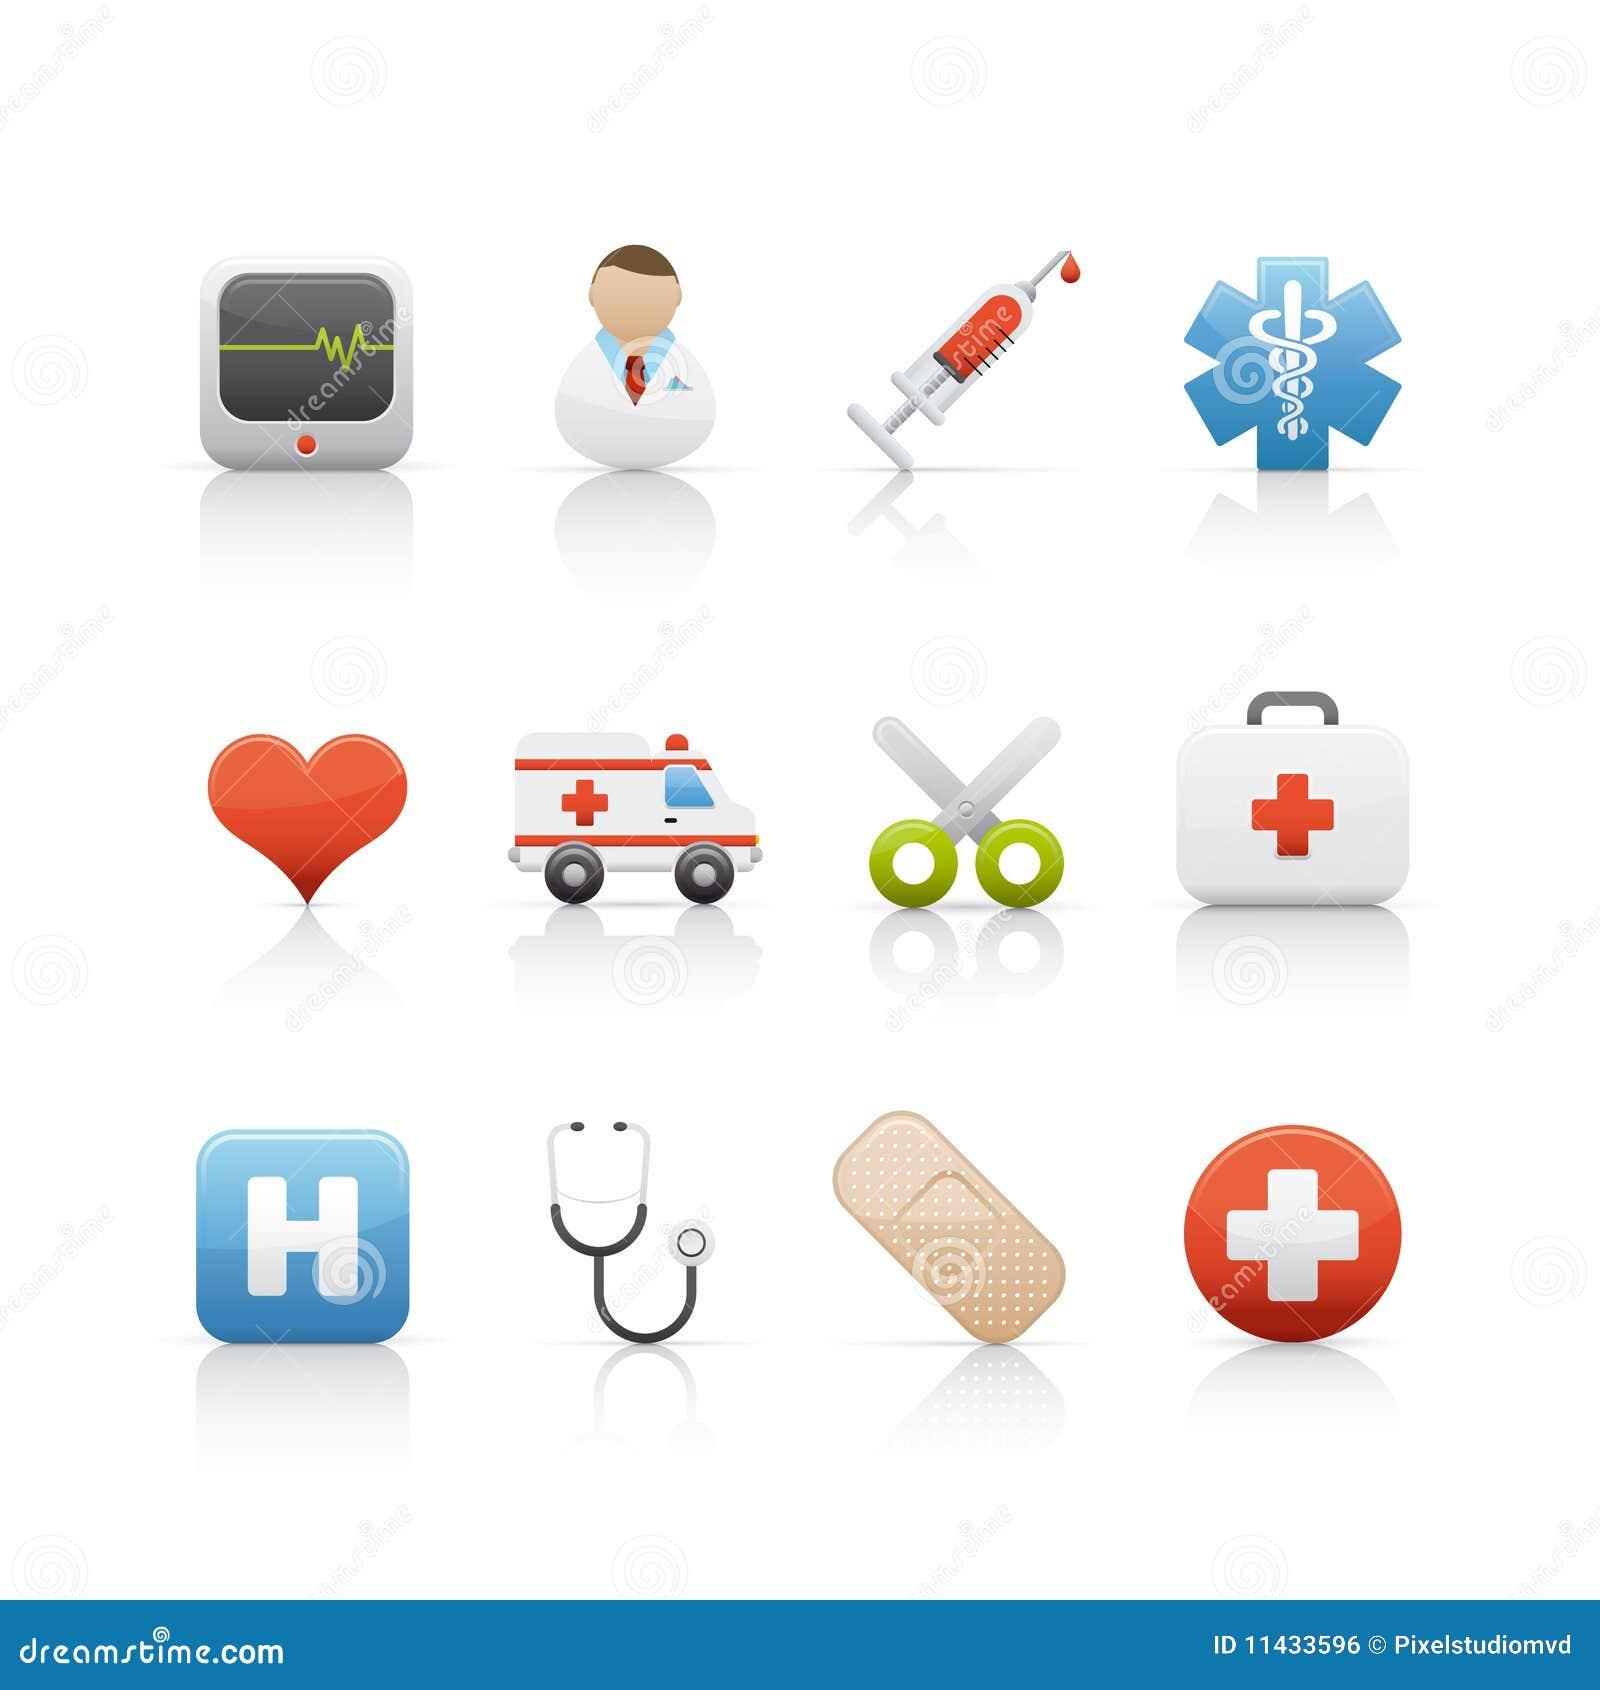 icon set medical and pharmacy 3 royalty free stock image